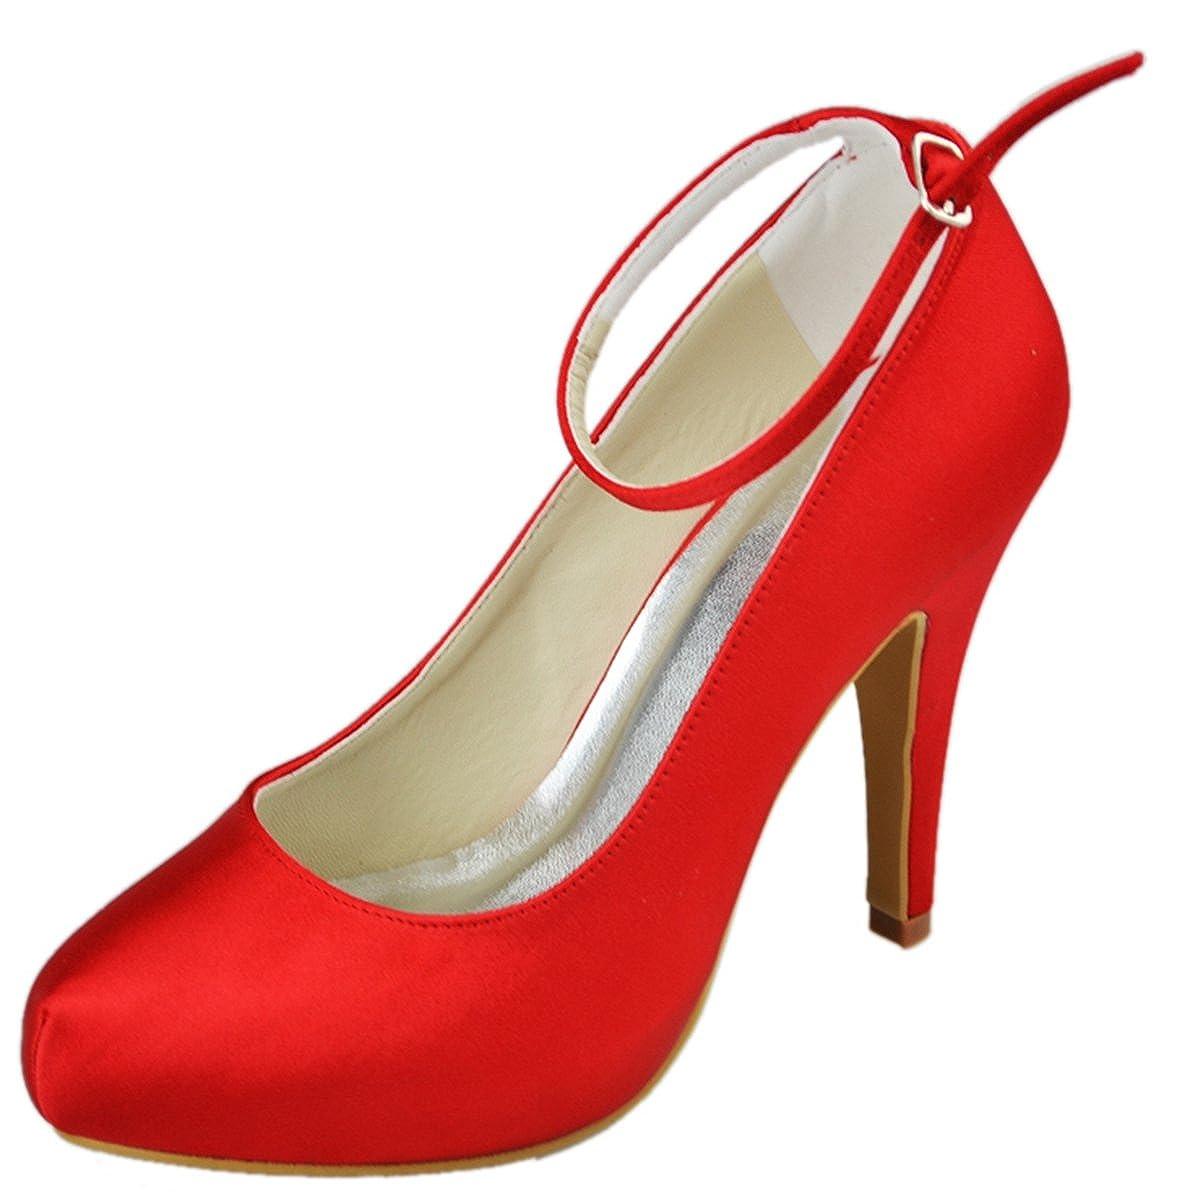 Minitoo 12216 , Bride de cheville B01N4FUDW1 Rouge femme Rouge - rouge 4bbd3ee - automaticcouplings.space